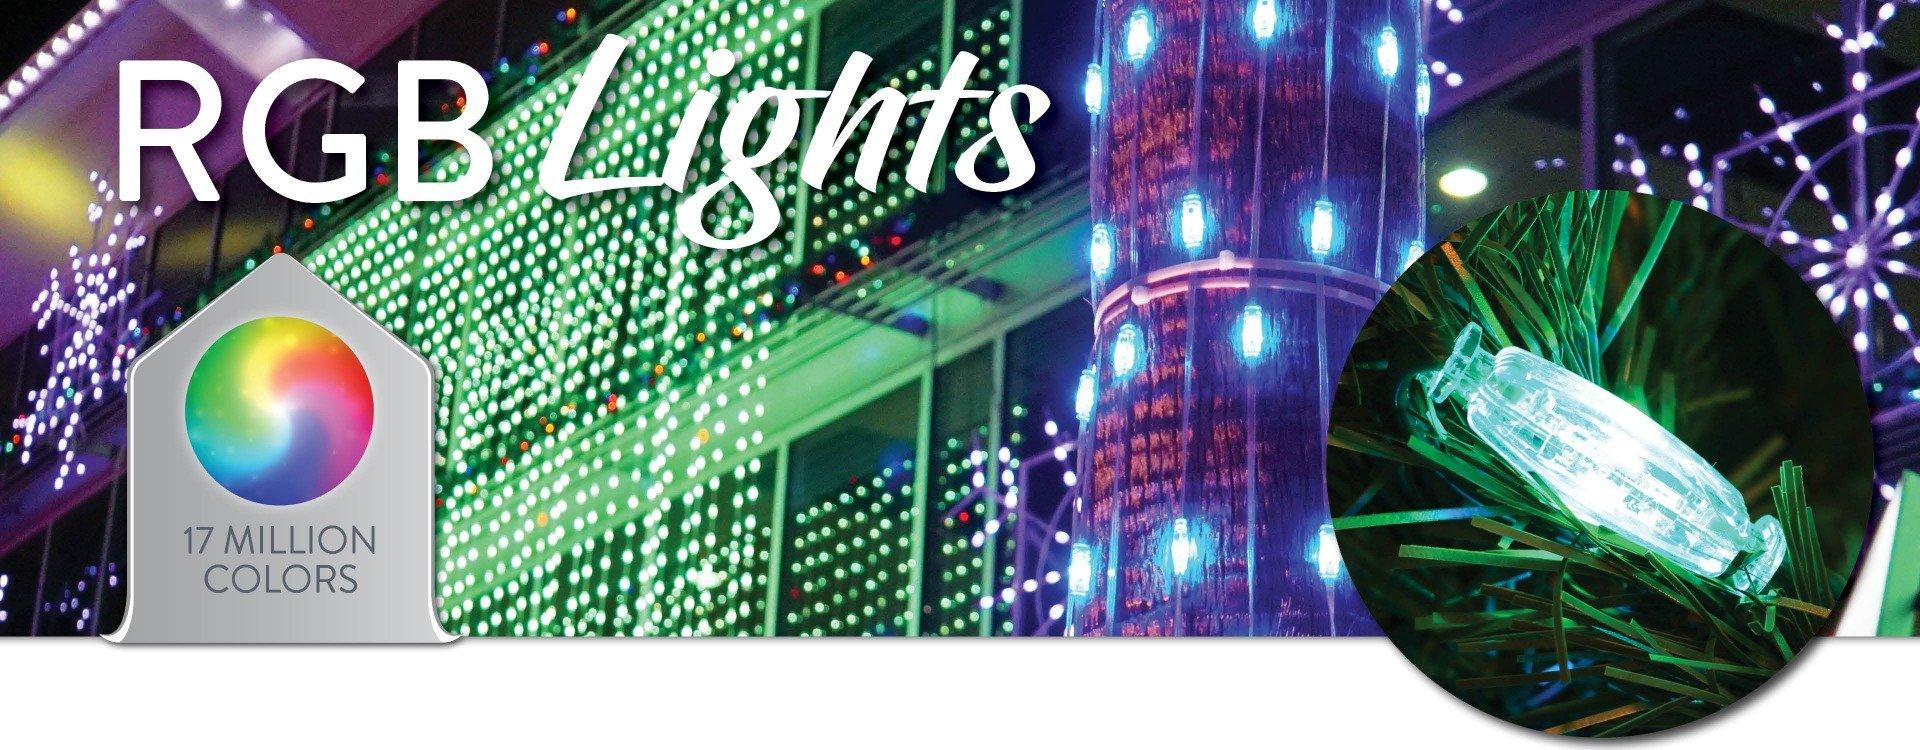 Animated RGB Lights